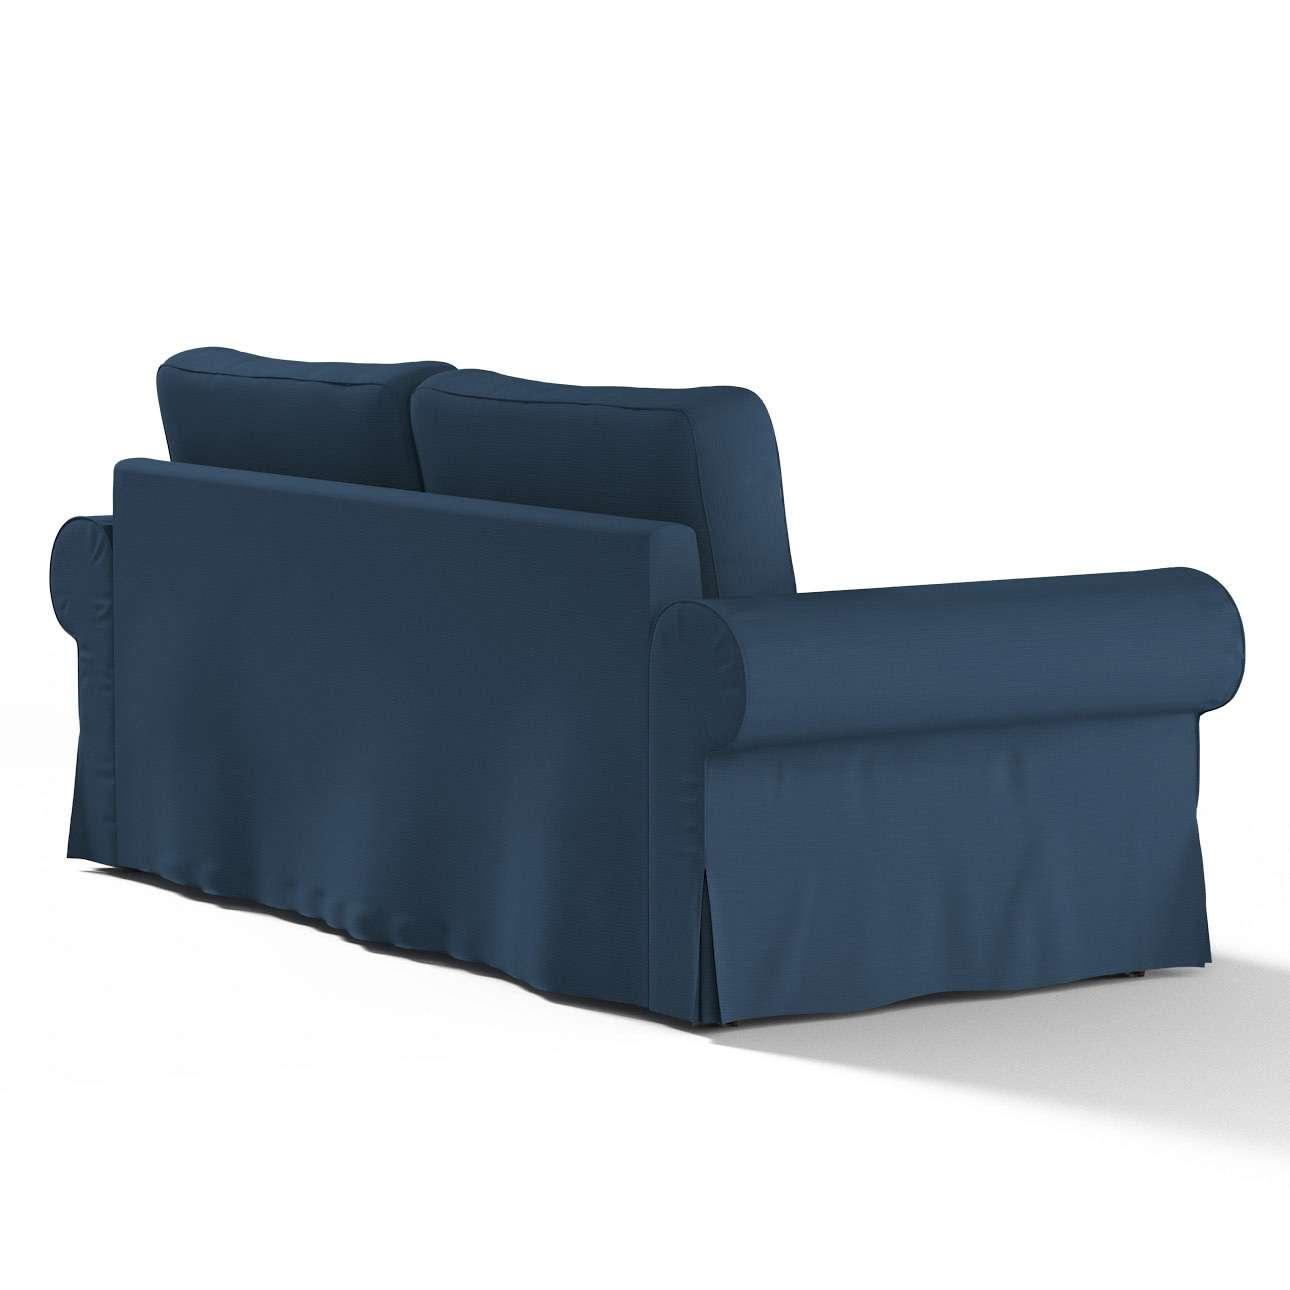 Backabro 3-Sitzer Sofabezug ausklappbar, marinenblau , 702